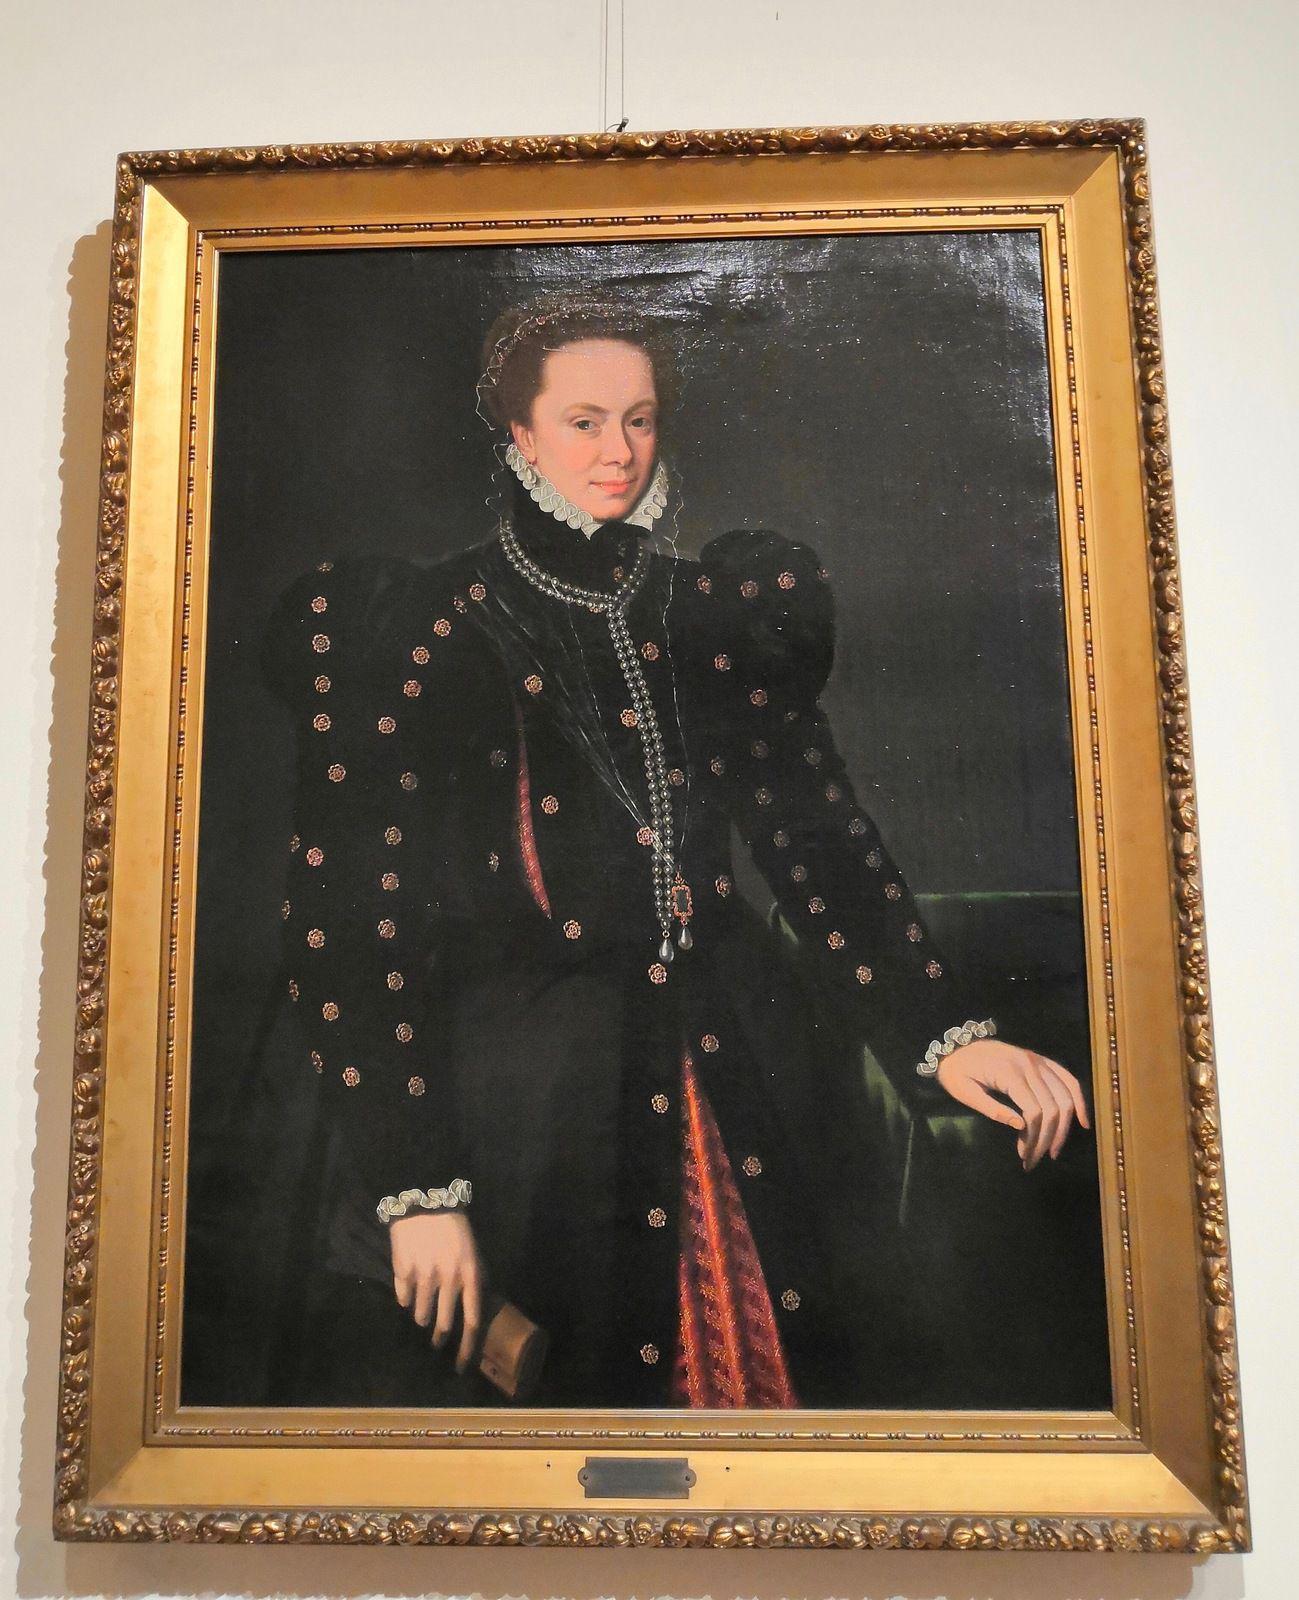 Bottega di Antonio Moro (Antoon Mor), Margherita d'Austria Duchessa di Parma e Piacenza, seconda metà XVI sec., Olio su tela